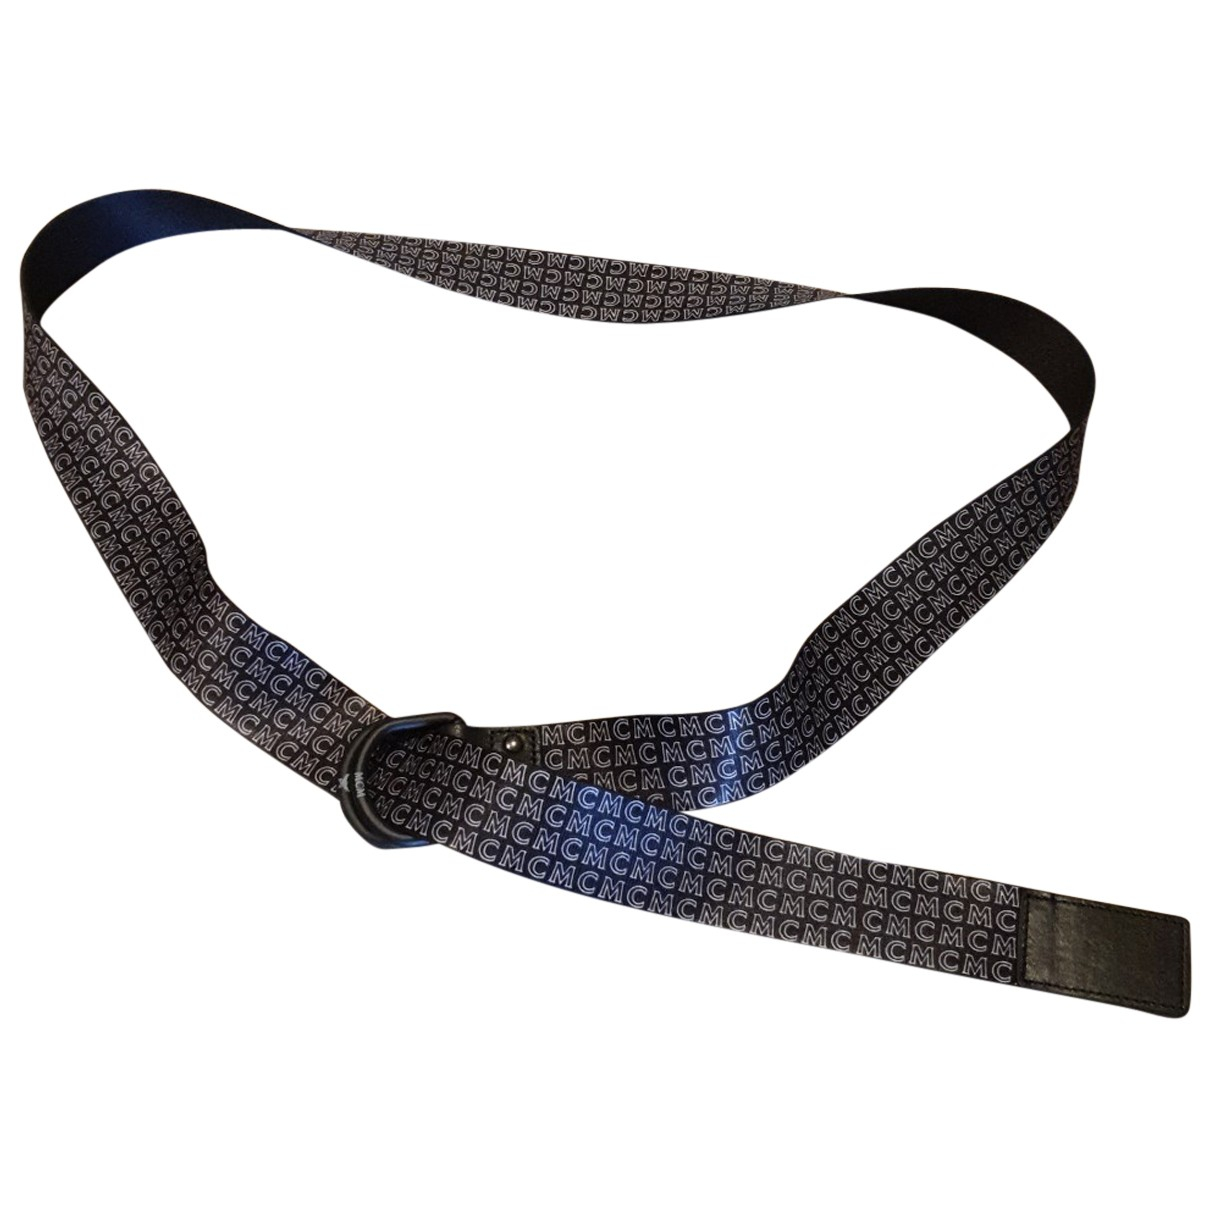 Cinturon de Lona Mcm